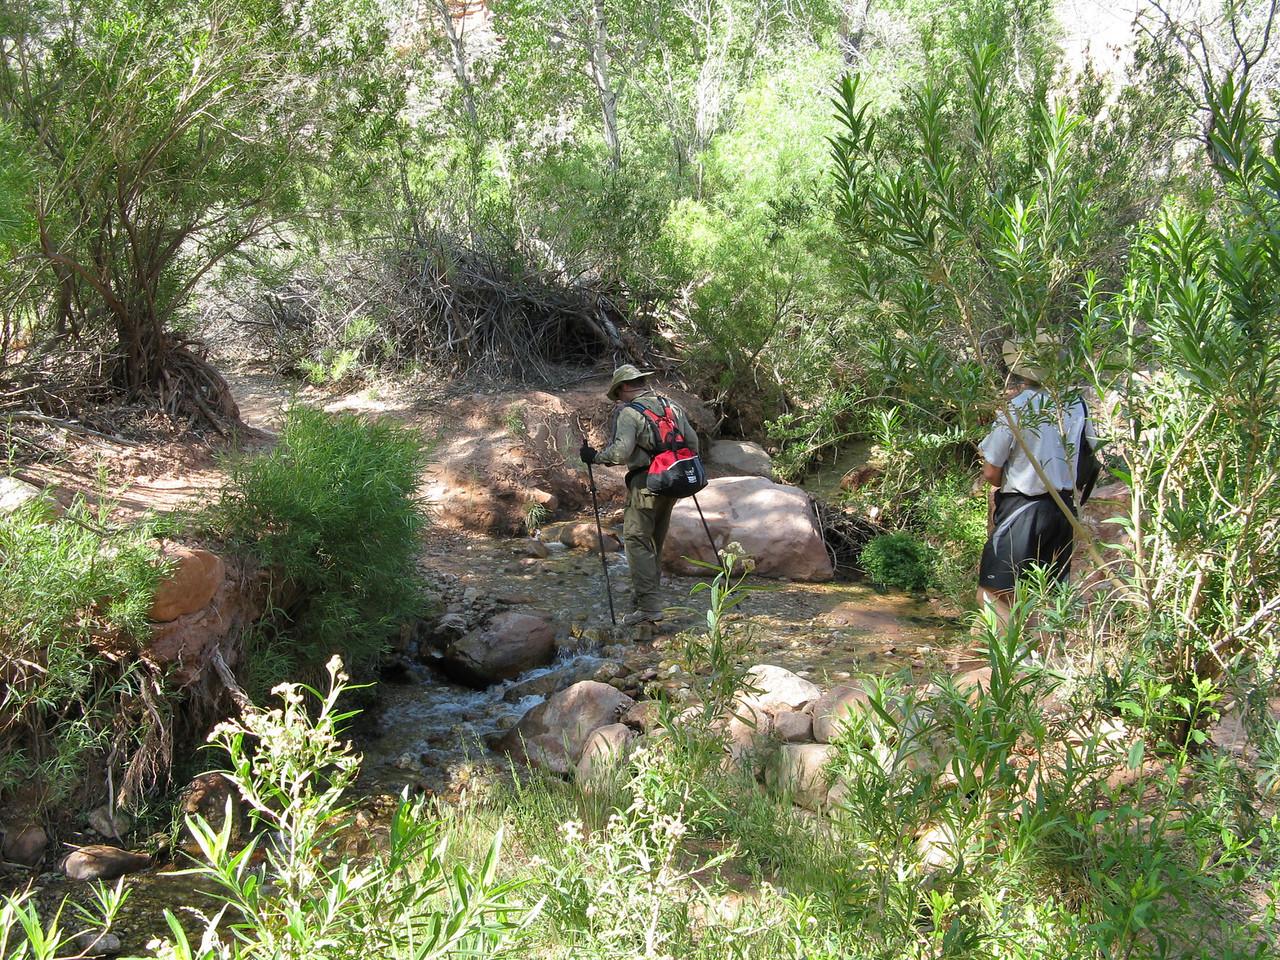 We cross the stream on stepping stones. RIchard in the stream, Dariusz behind.